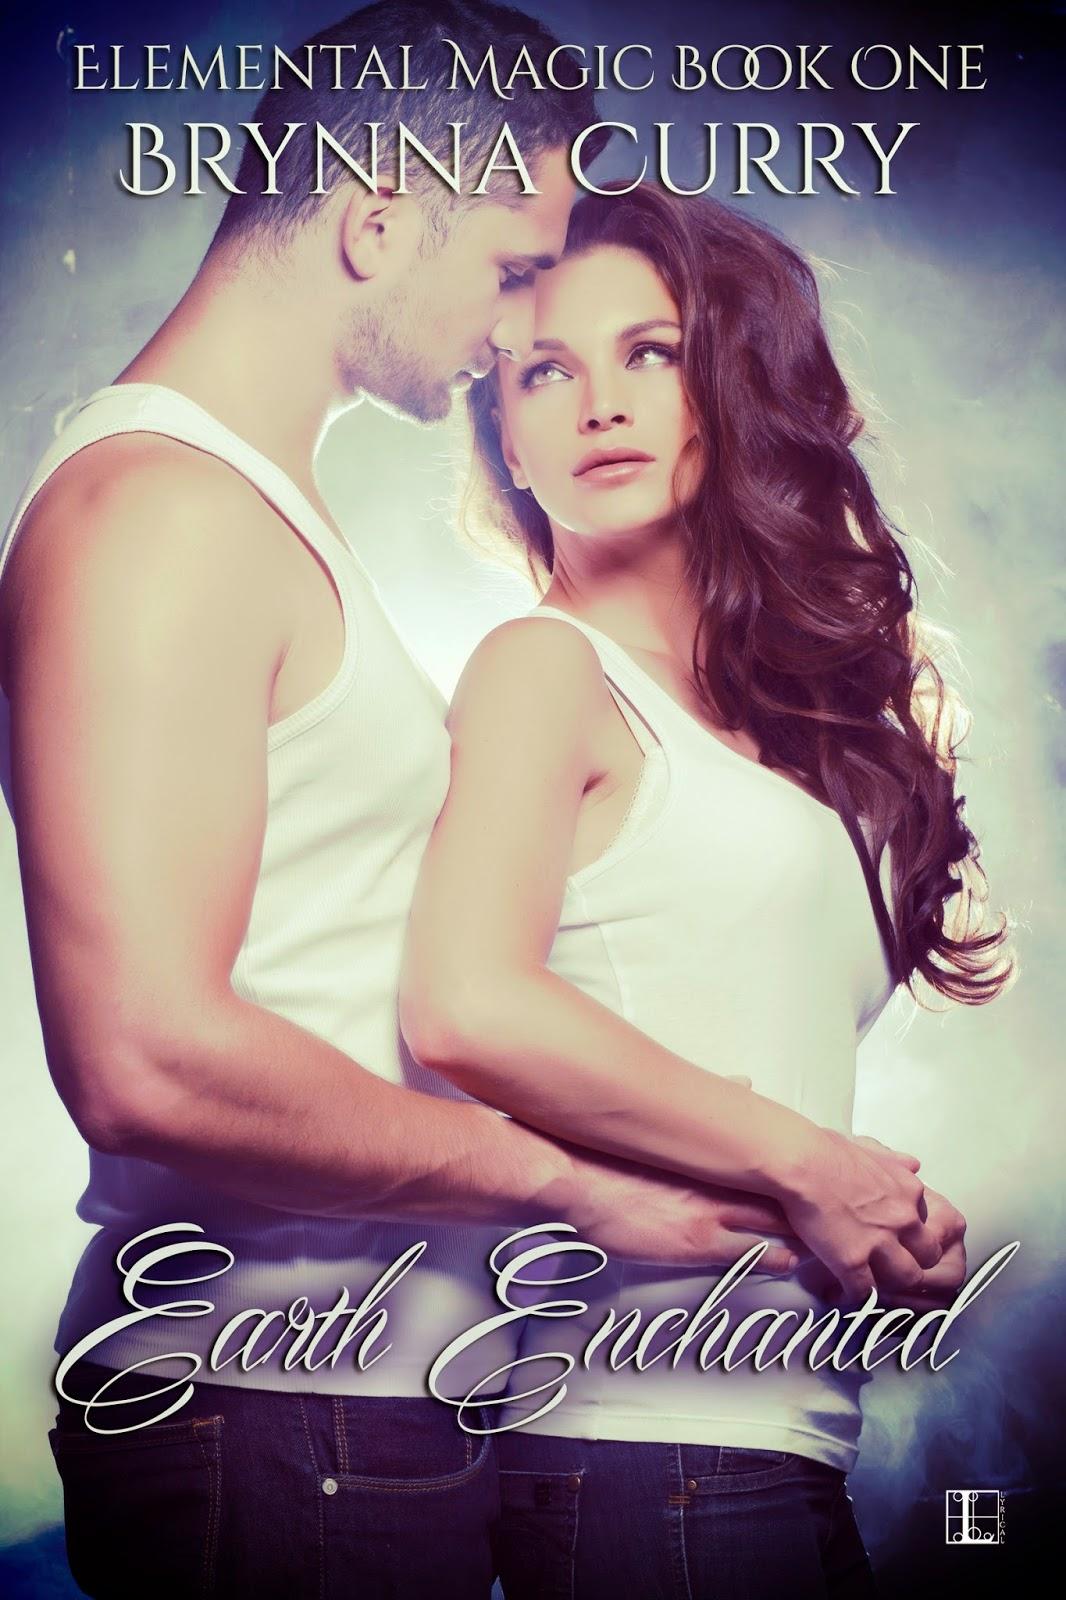 Elemental Magic Book 1: Earth Enchanted